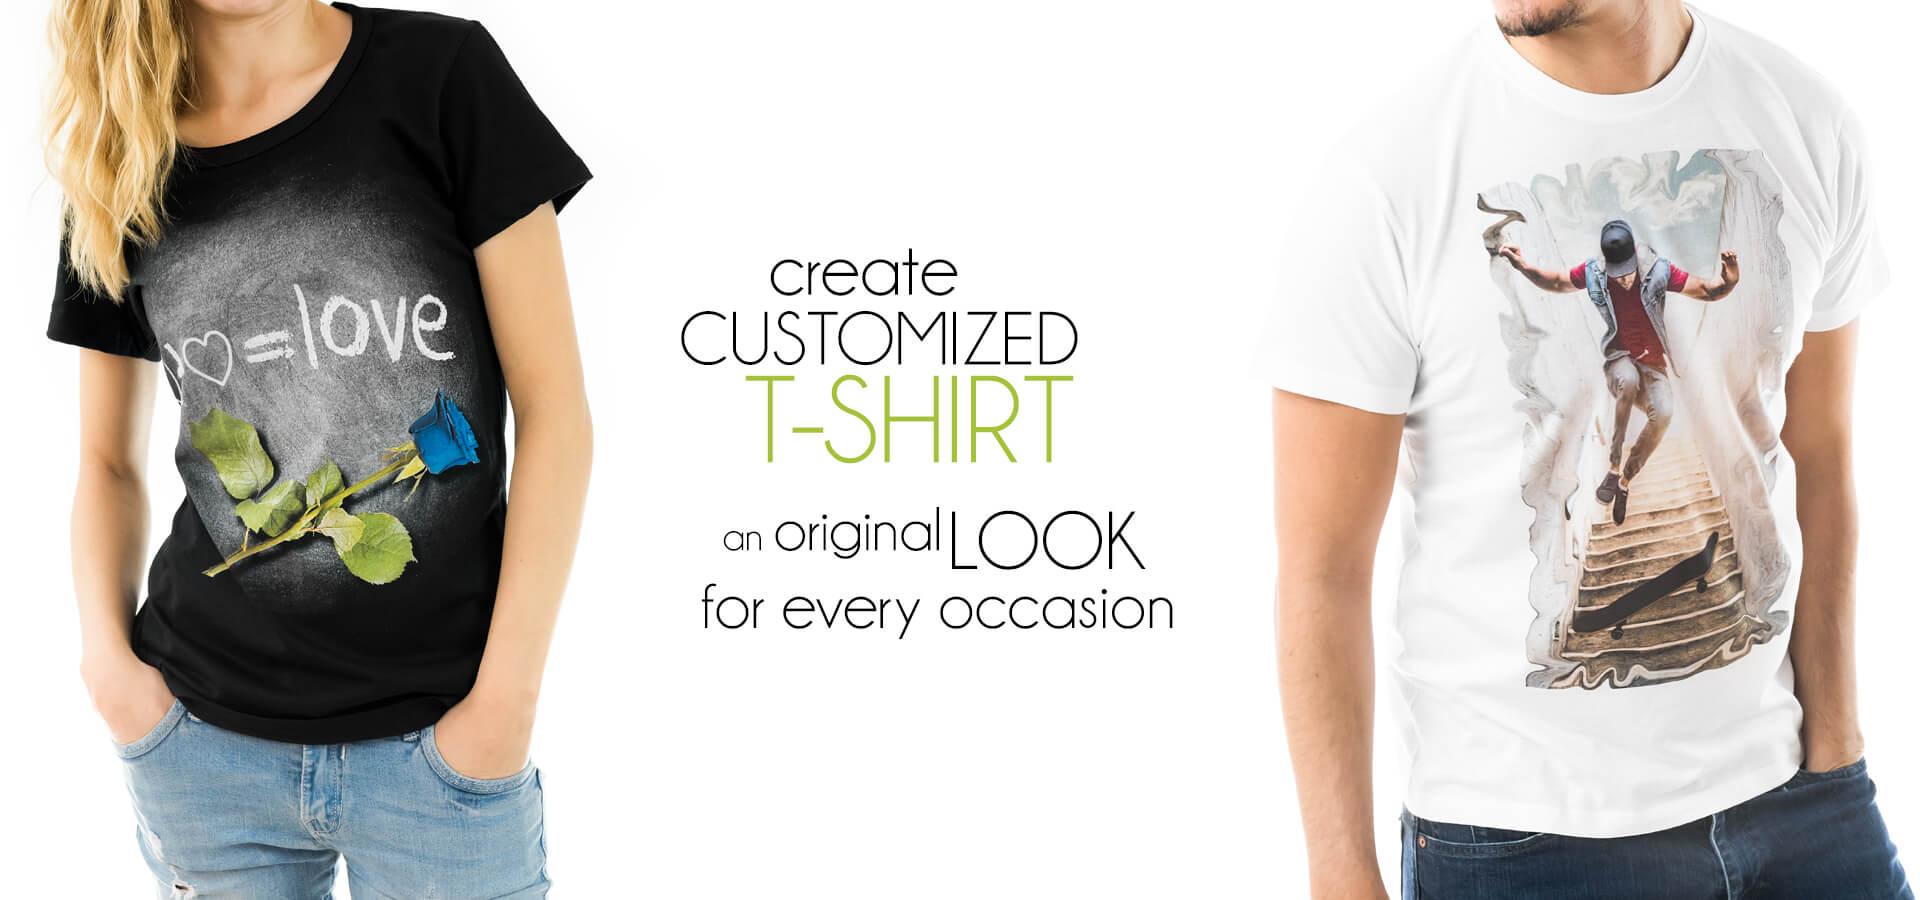 customized-t-shirt